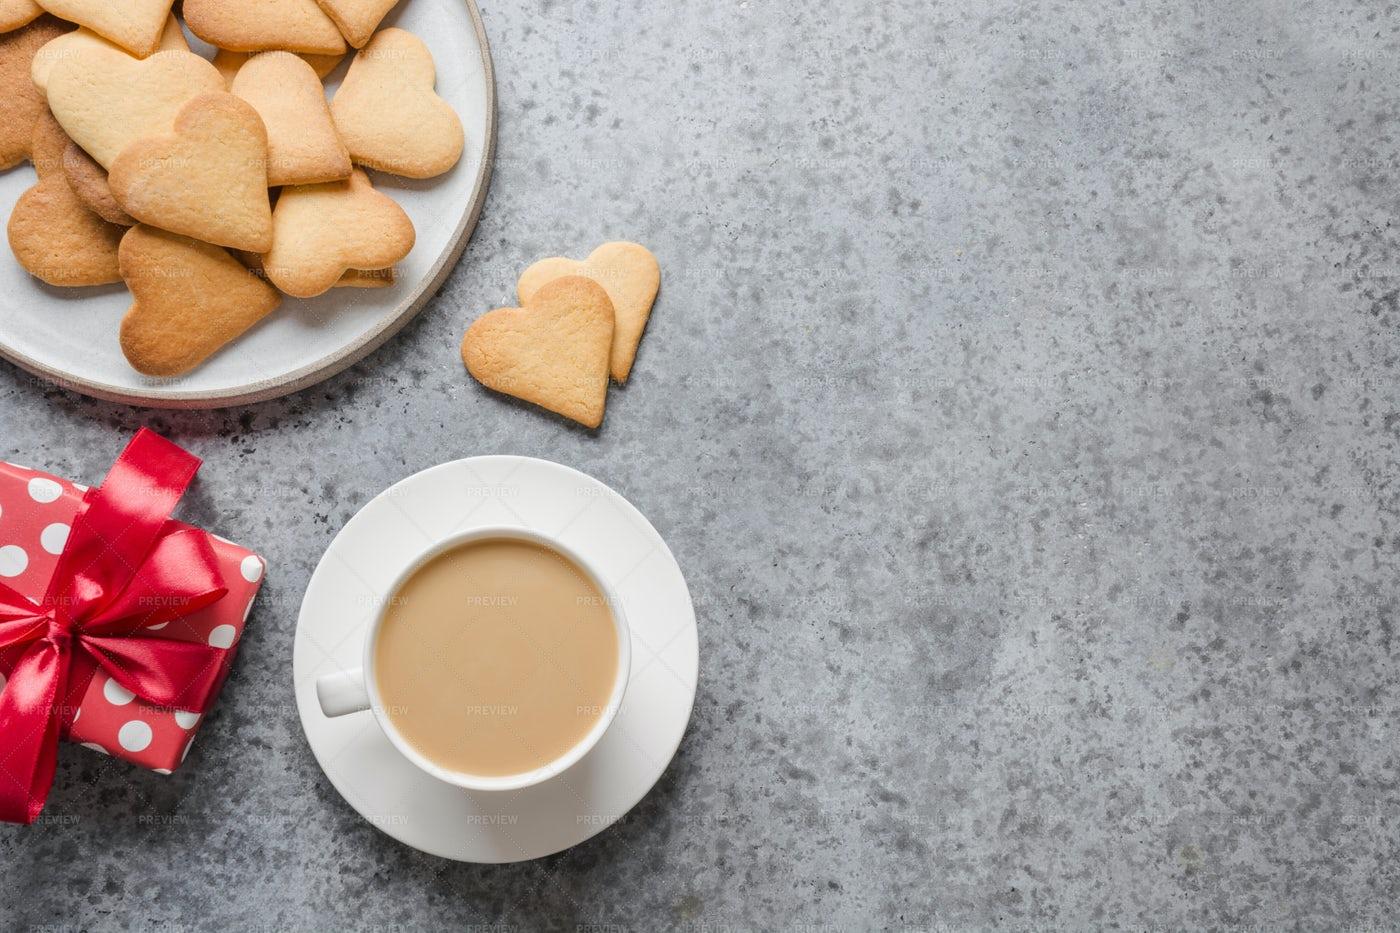 Homemade Heart Cookies And Coffee: Stock Photos